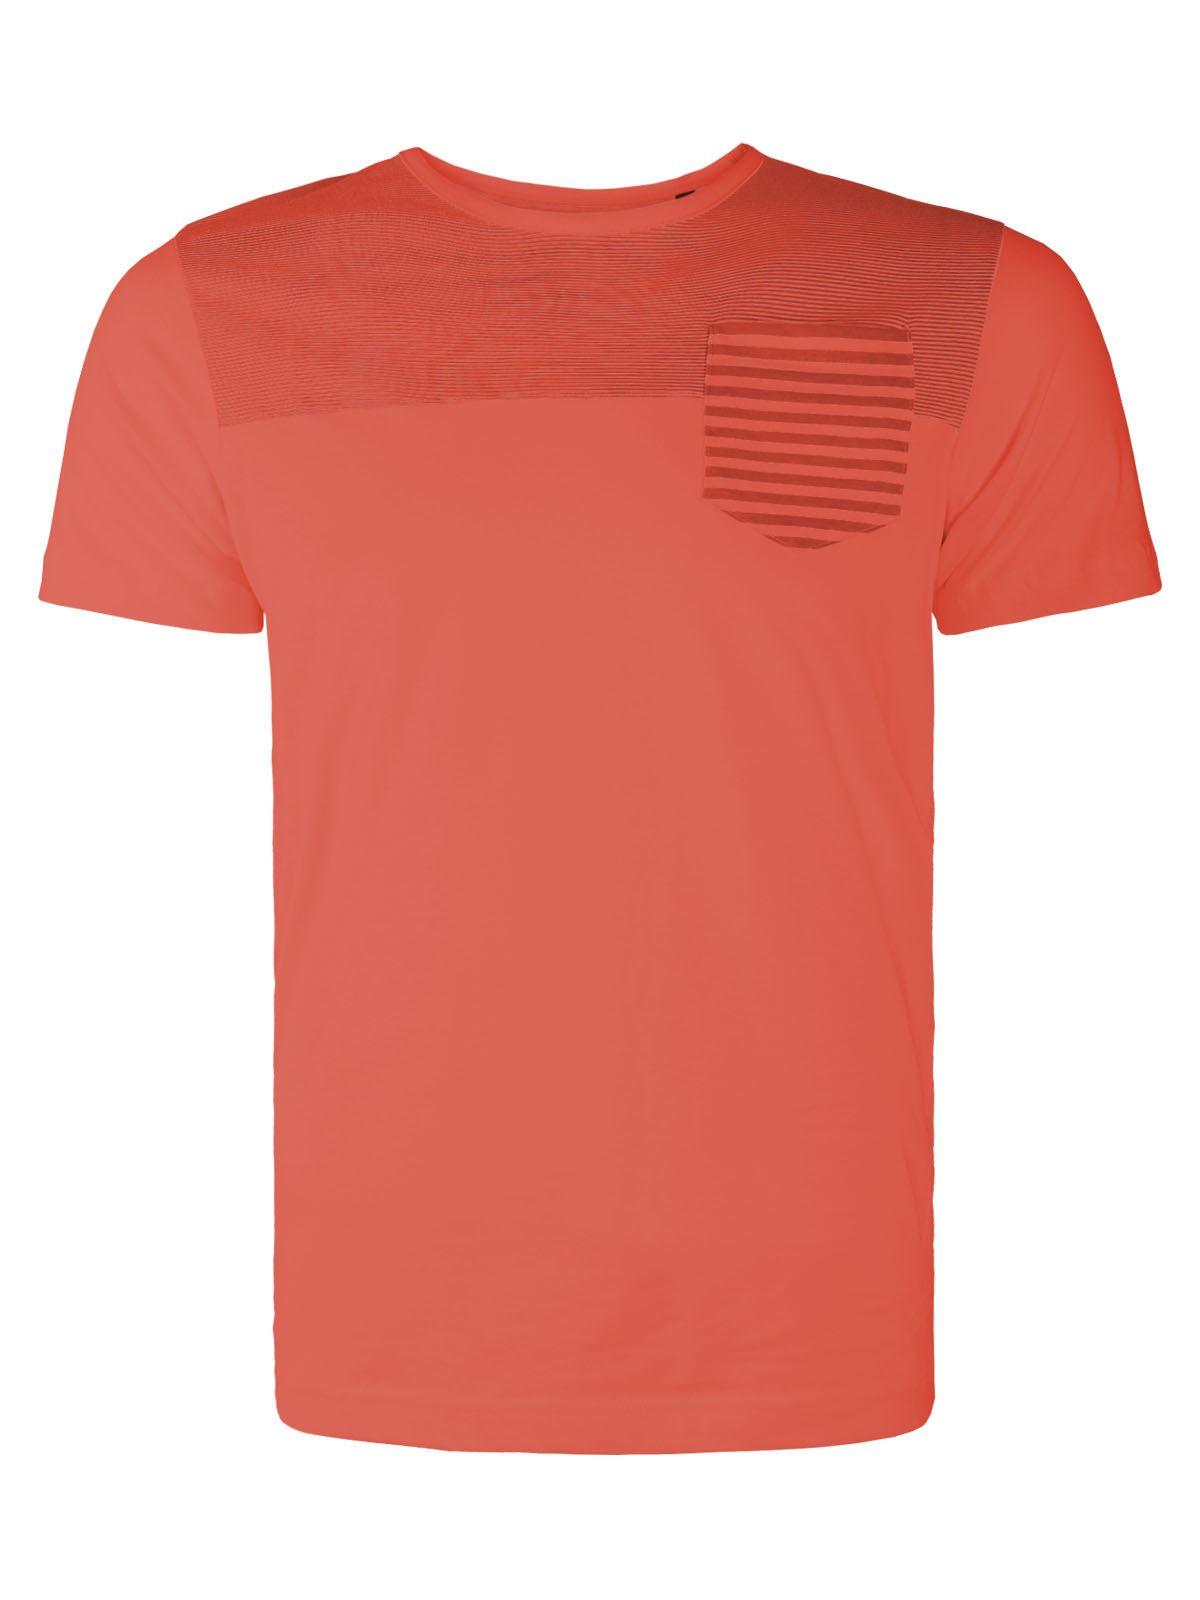 mens pocket short sleeve summer casual cotton stripped top. Black Bedroom Furniture Sets. Home Design Ideas